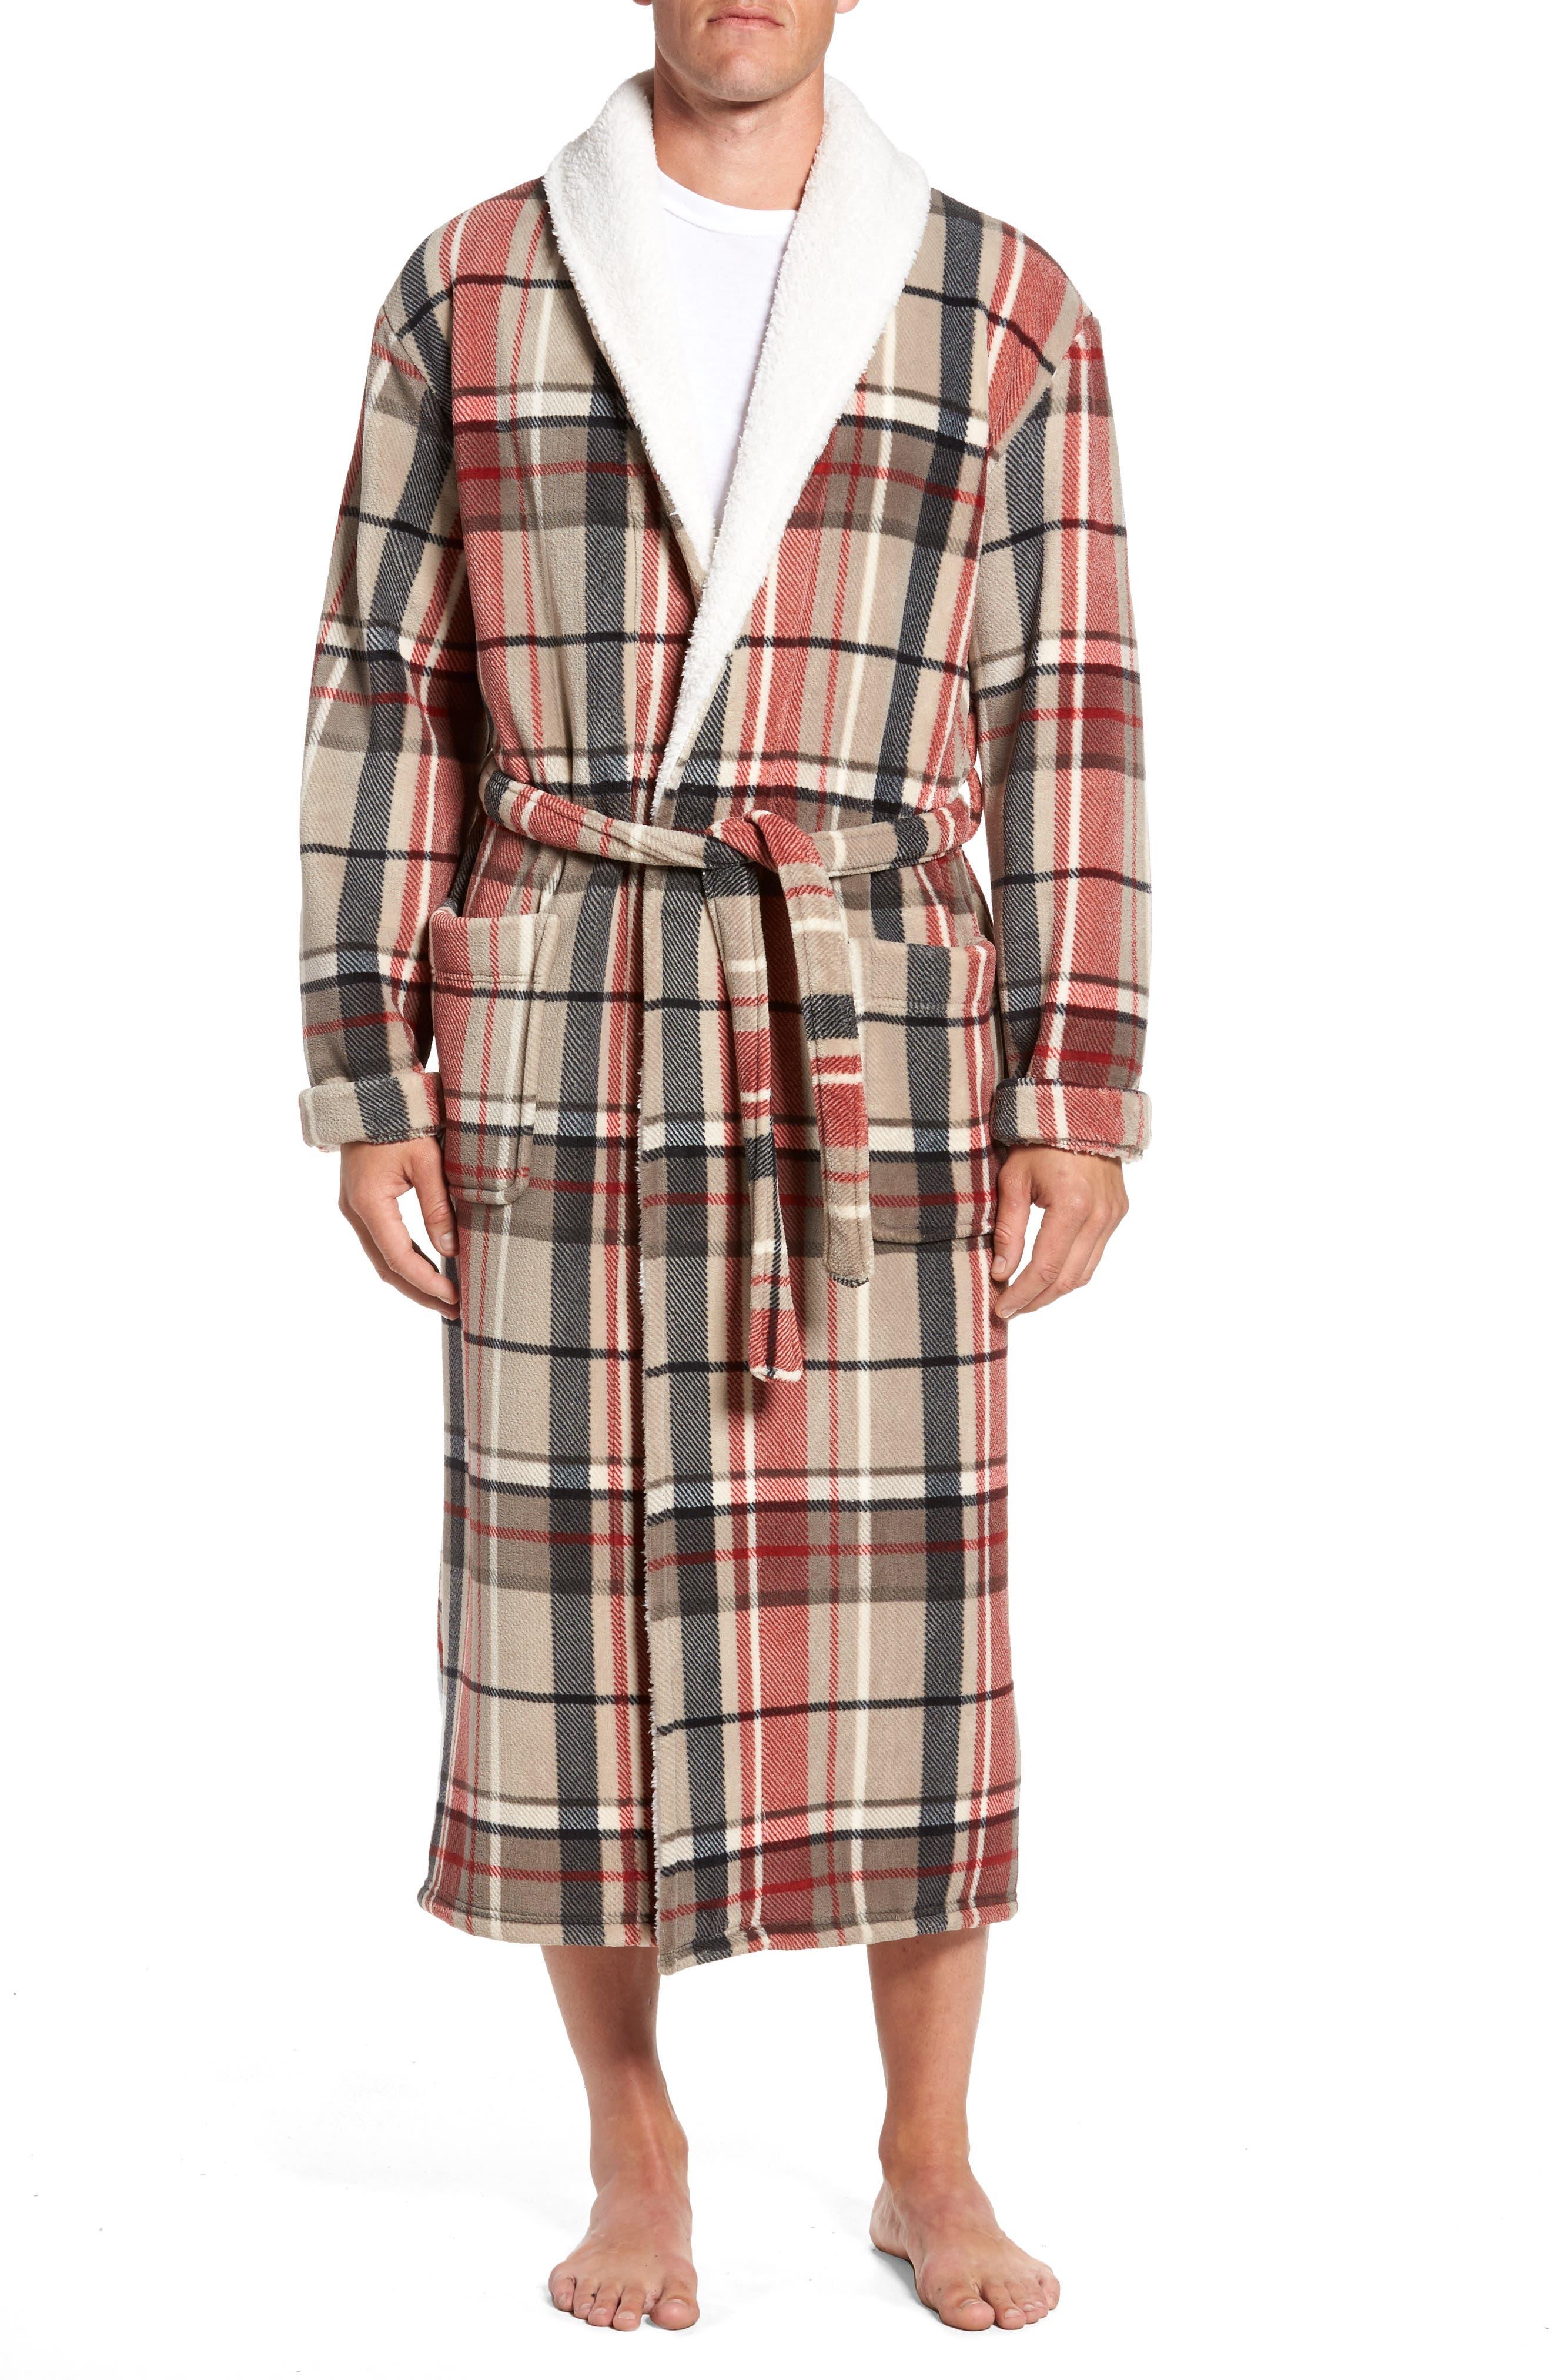 Majestic International Holly Jolly Robe